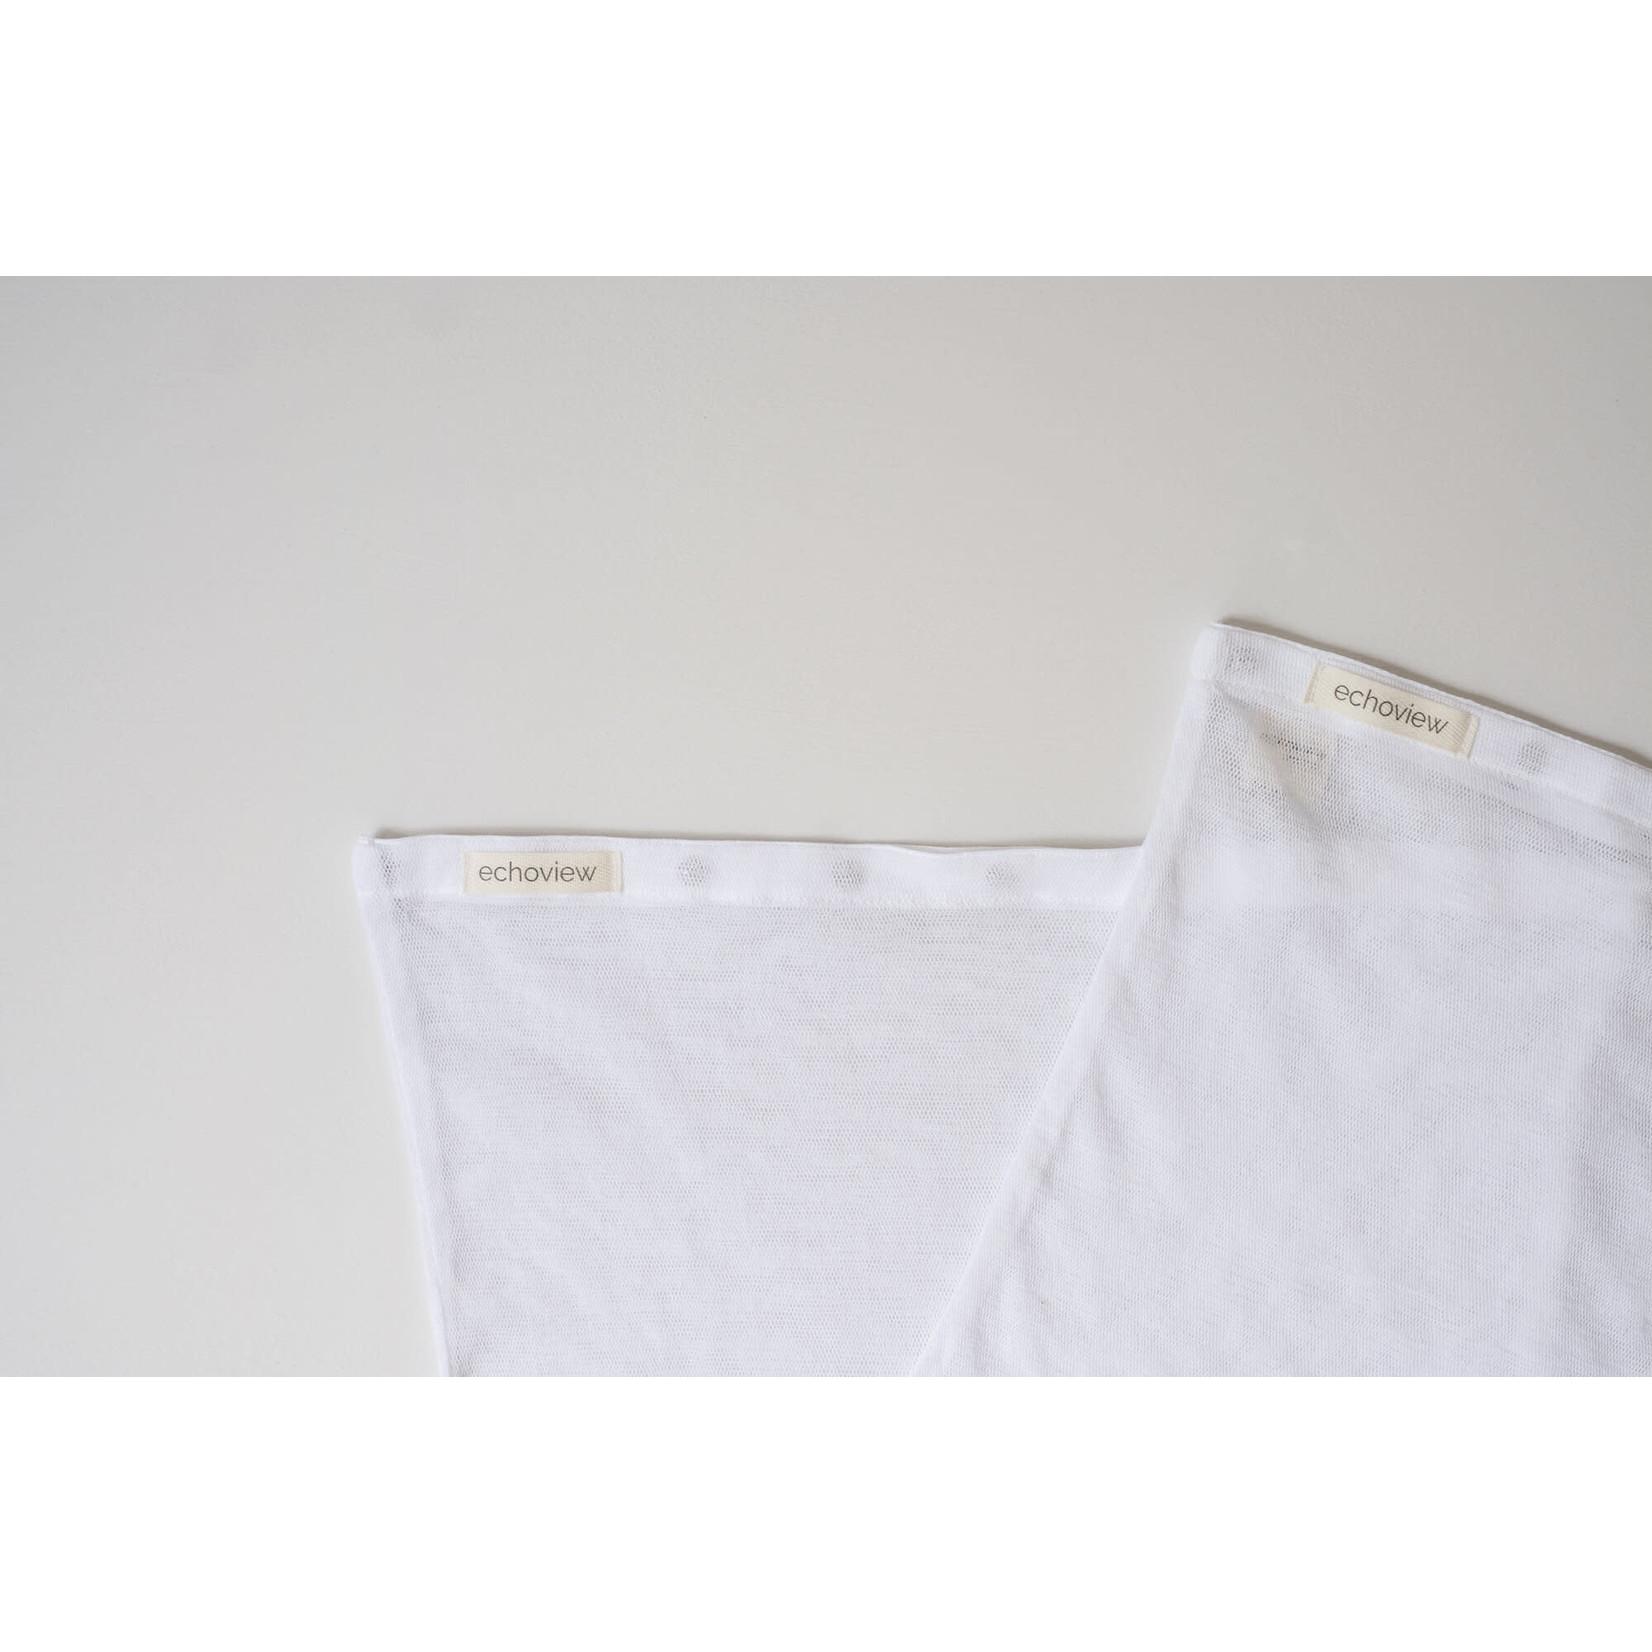 Echoview Fiber Mill Cotton Mesh Delicates Laundry Bag